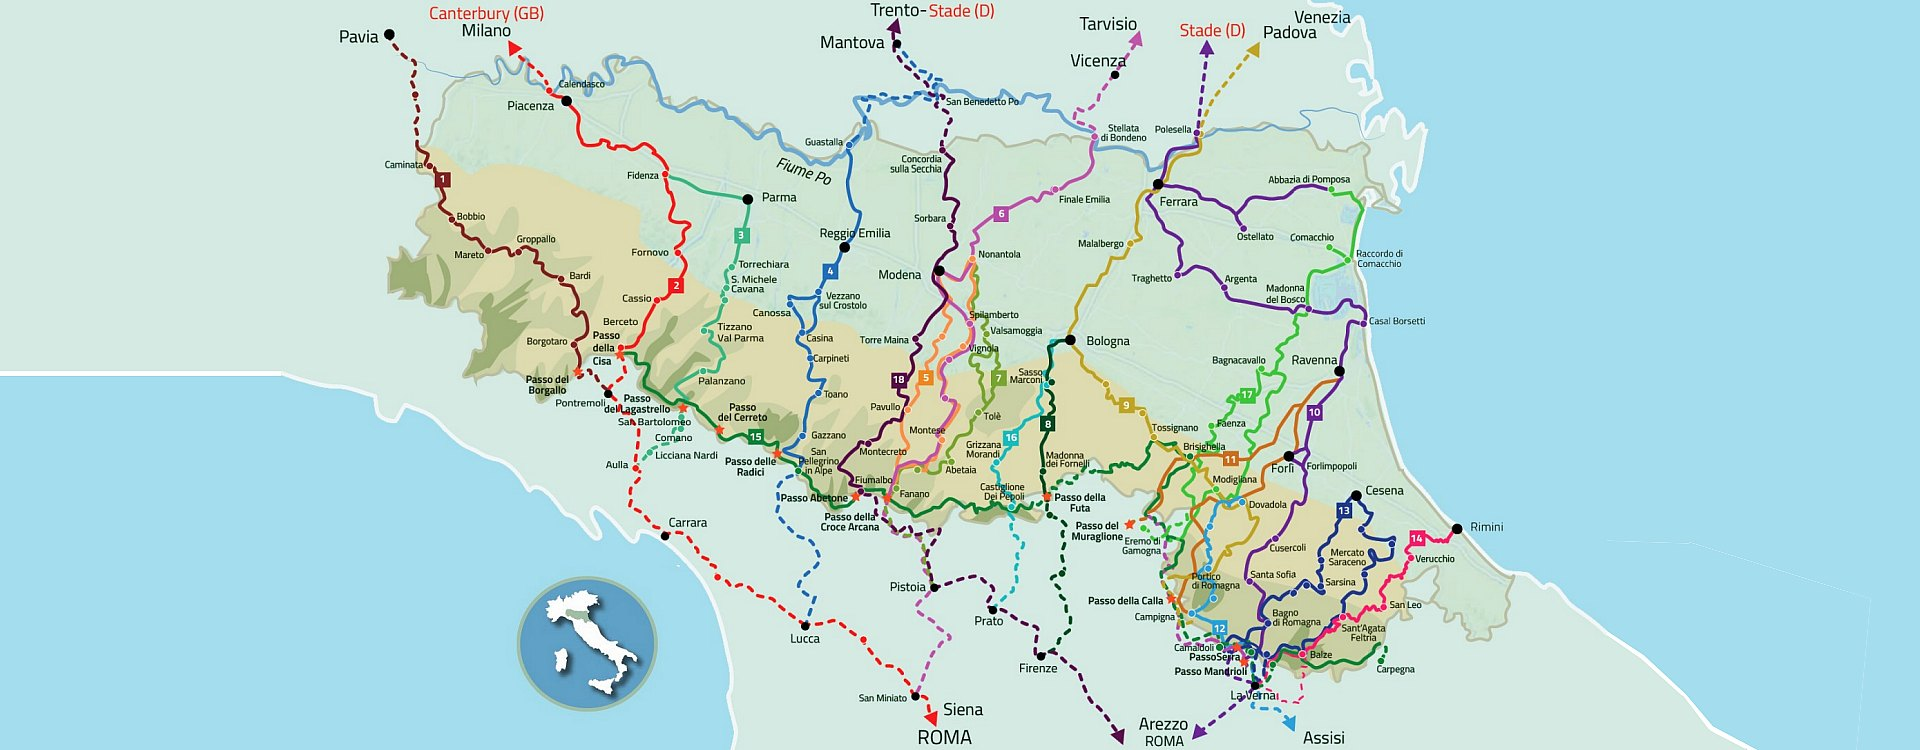 Cartina Emilia Toscana.Cammini Emilia Romagna 18 Itinerari Tra Trekking E Spiritualita Travel Emilia Romagna